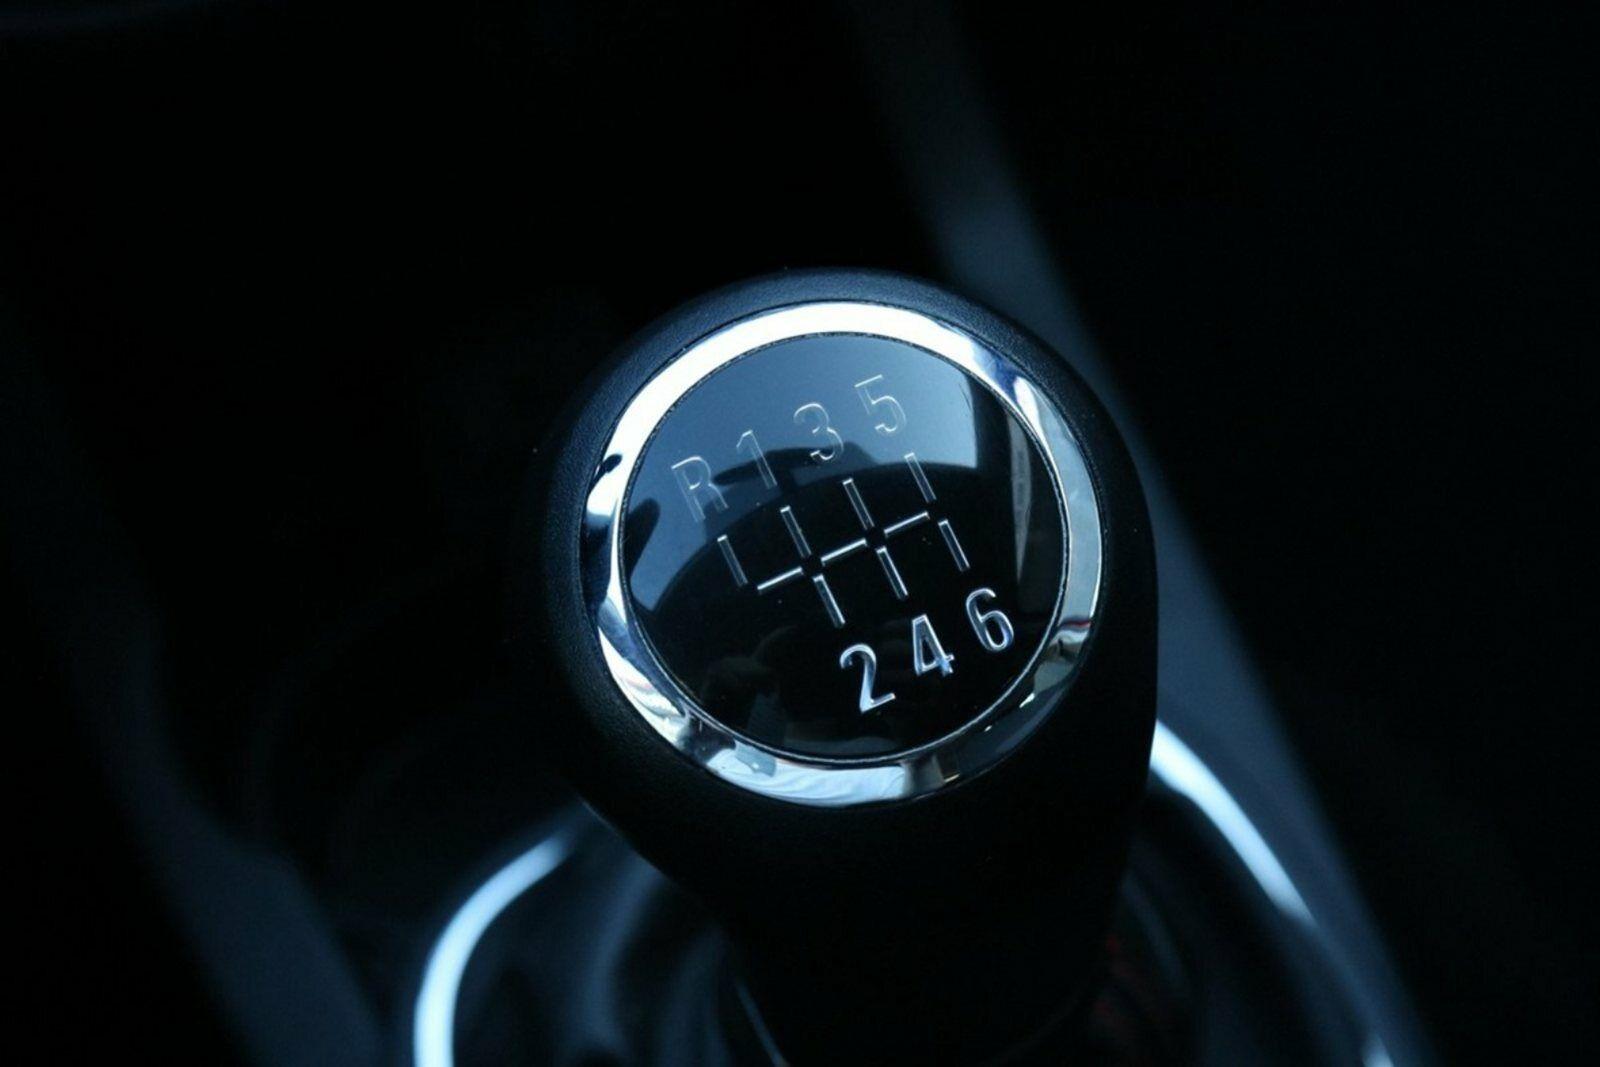 Opel Corsa CDTi 130 Sport